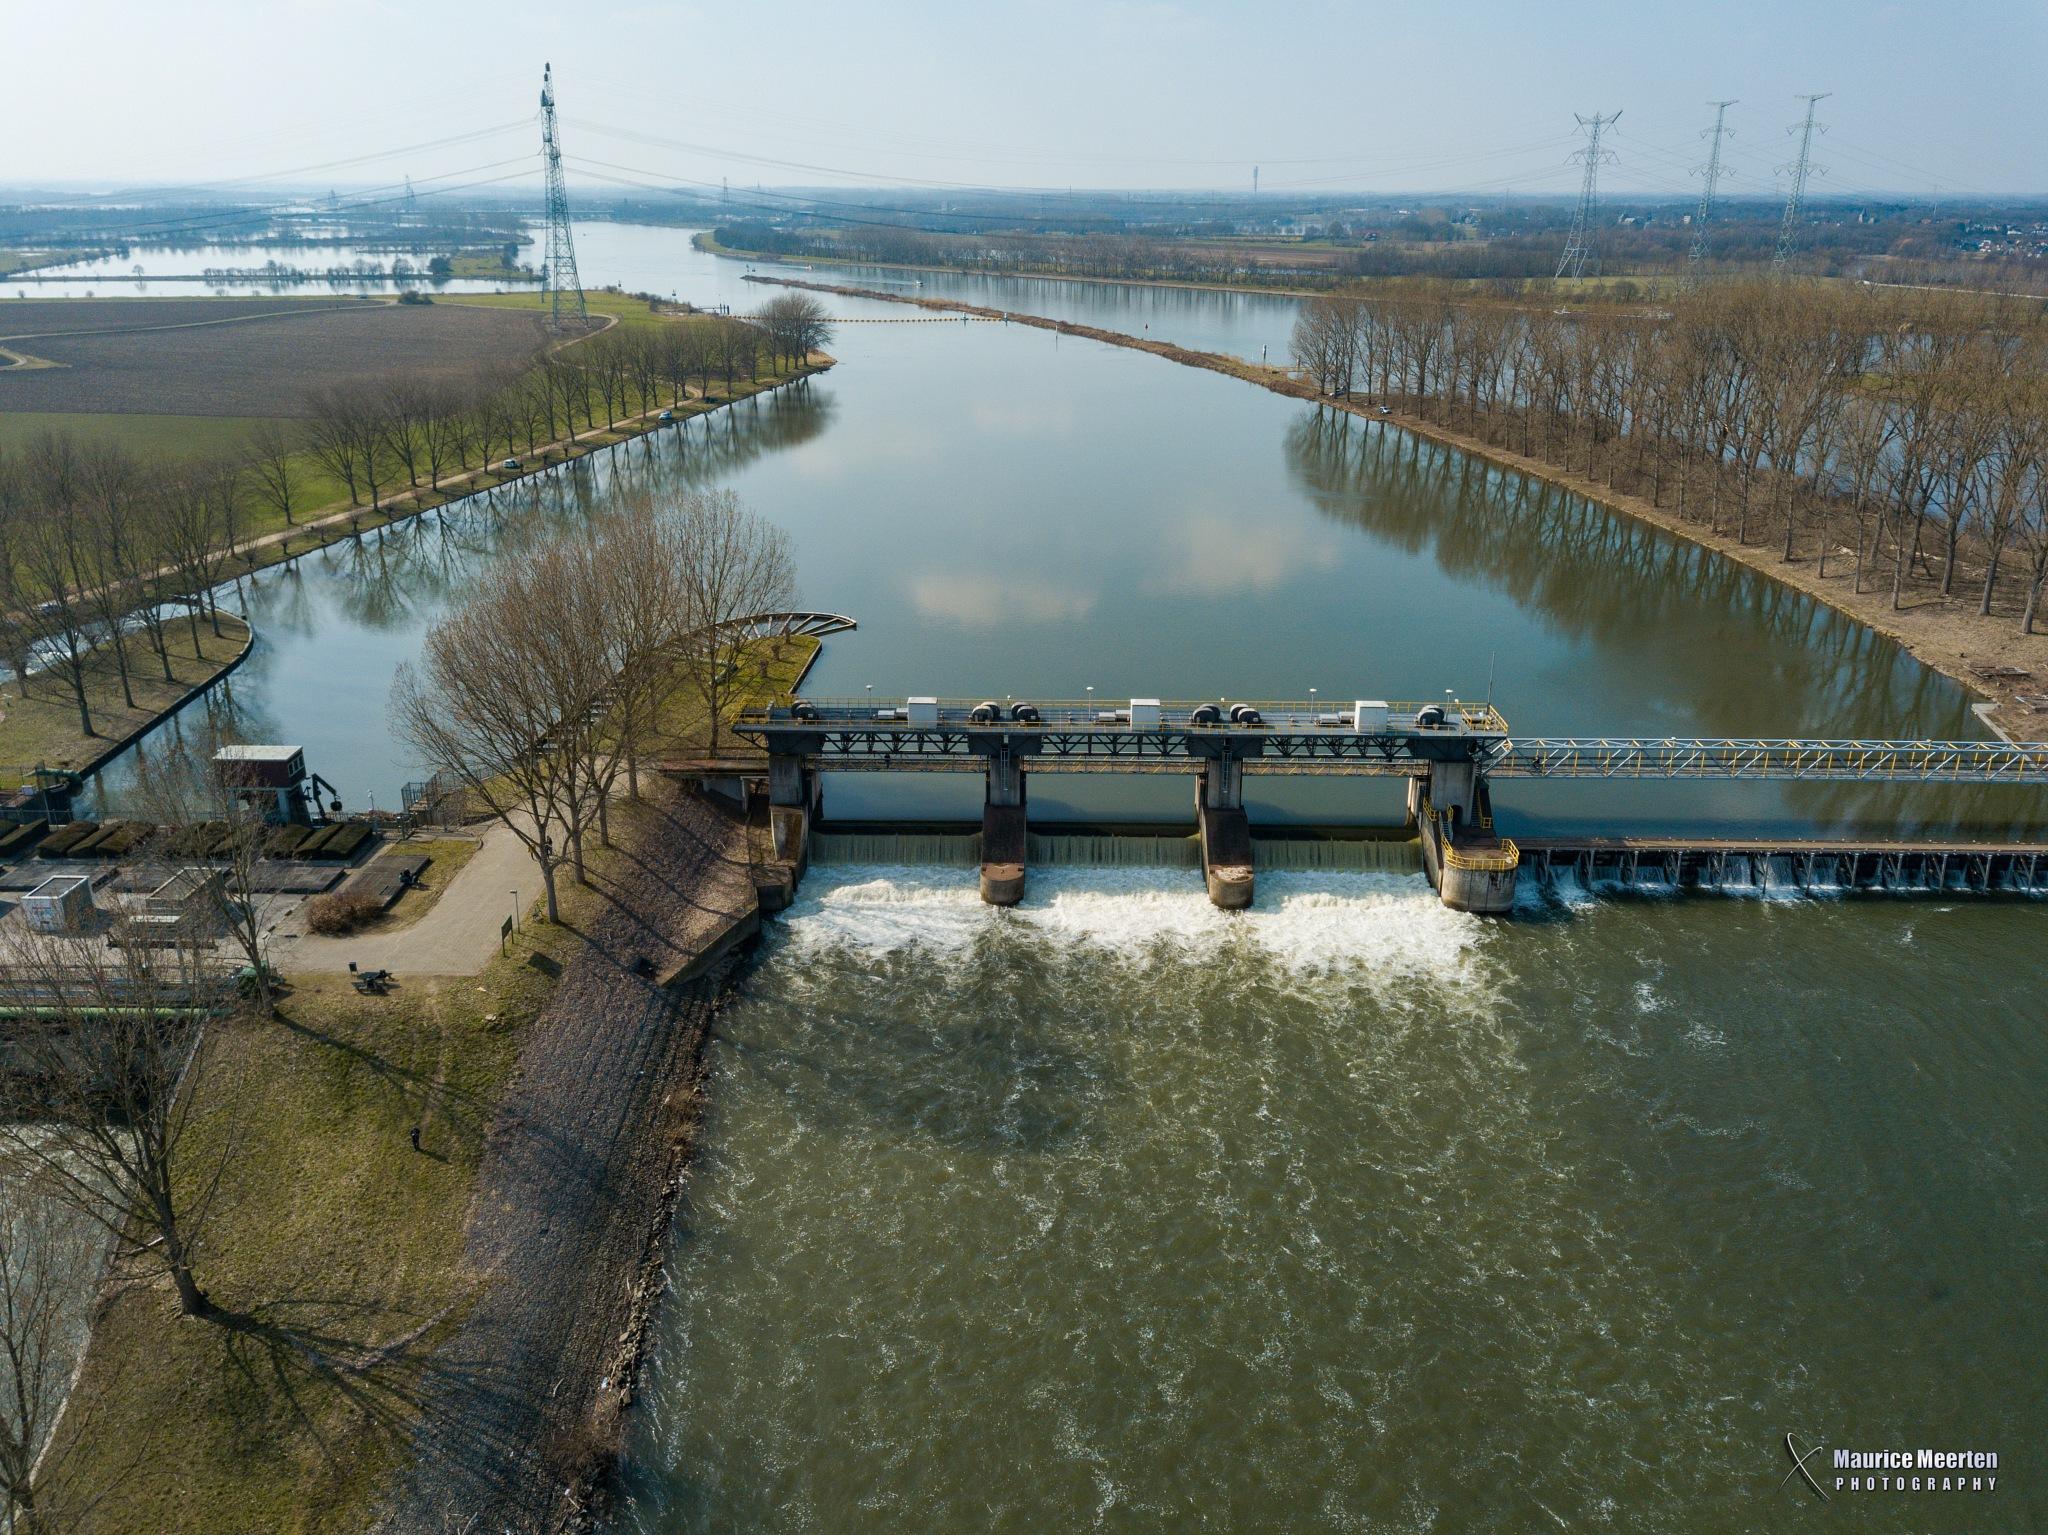 Aerial dam in Linne by Maurice Meerten